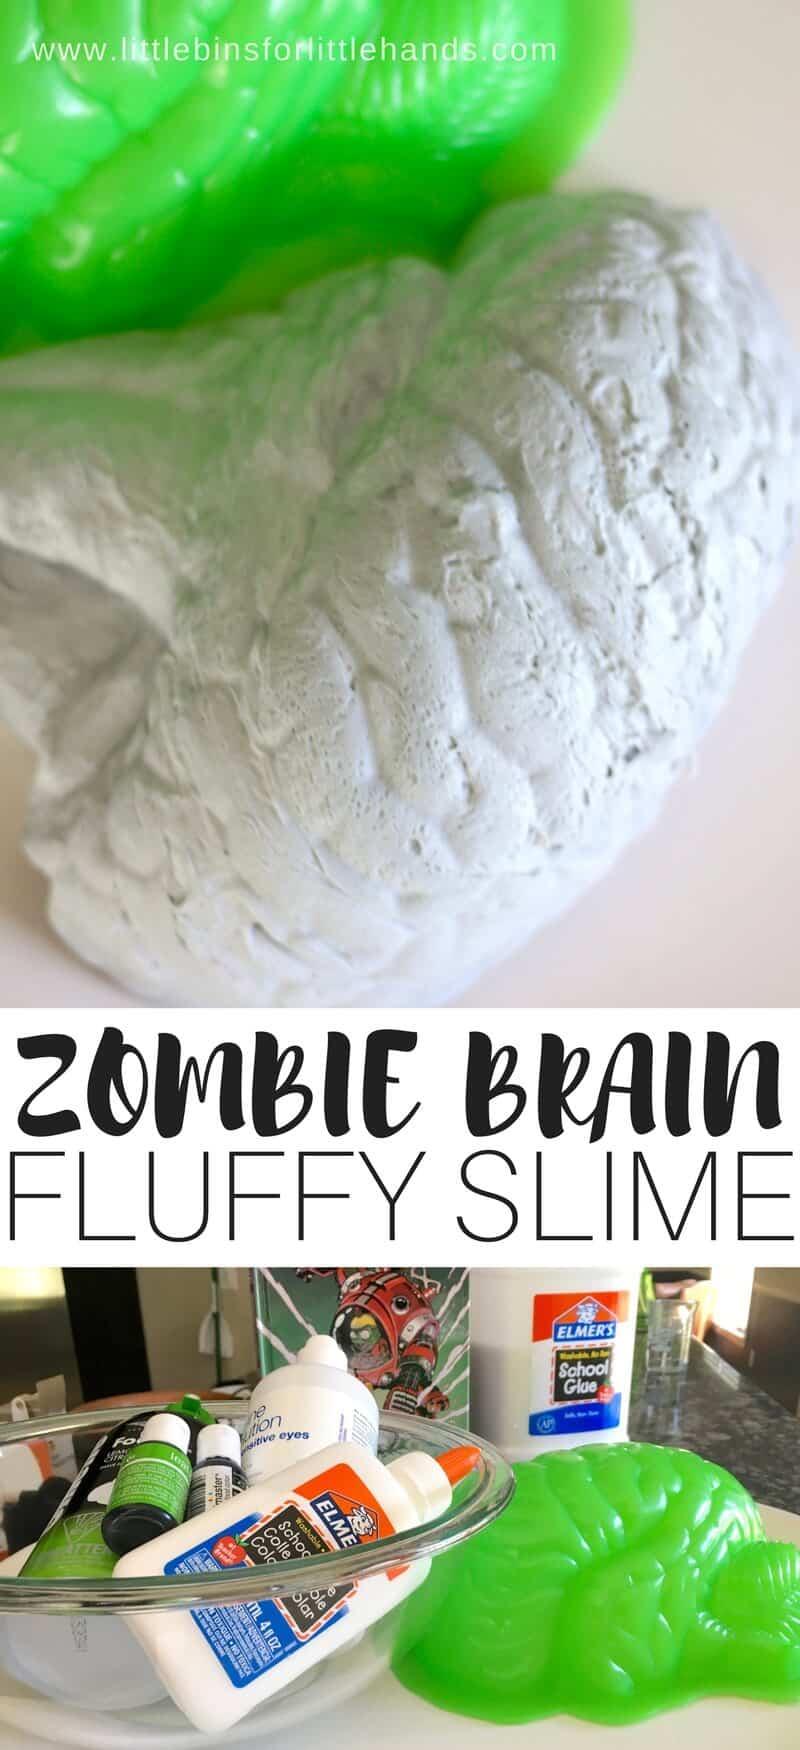 Zombie brain fluffy slime